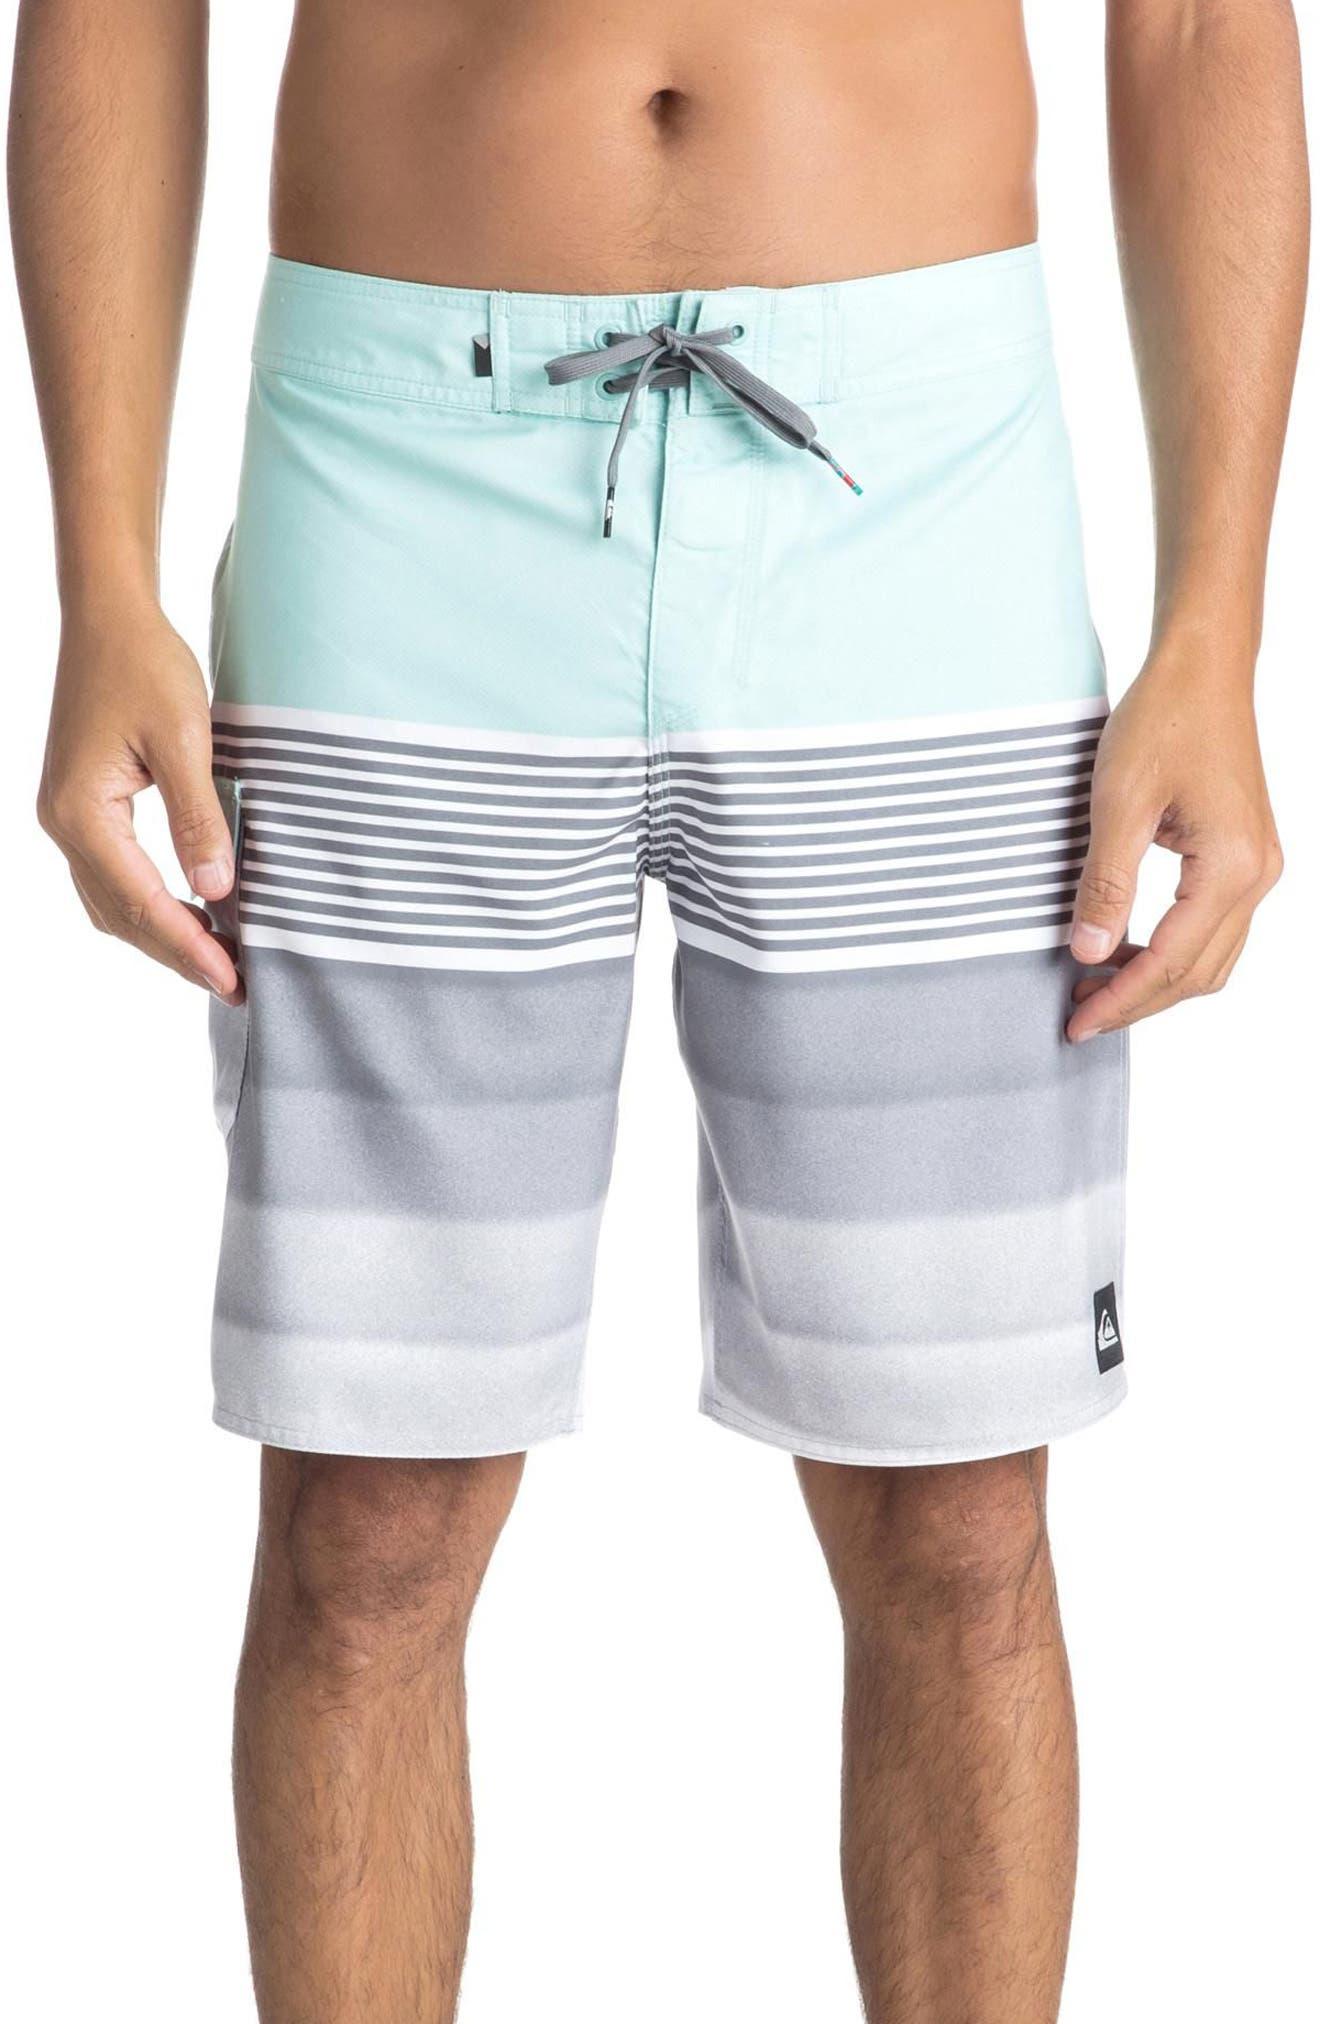 Division Board Shorts,                         Main,                         color, Eggshell Blue